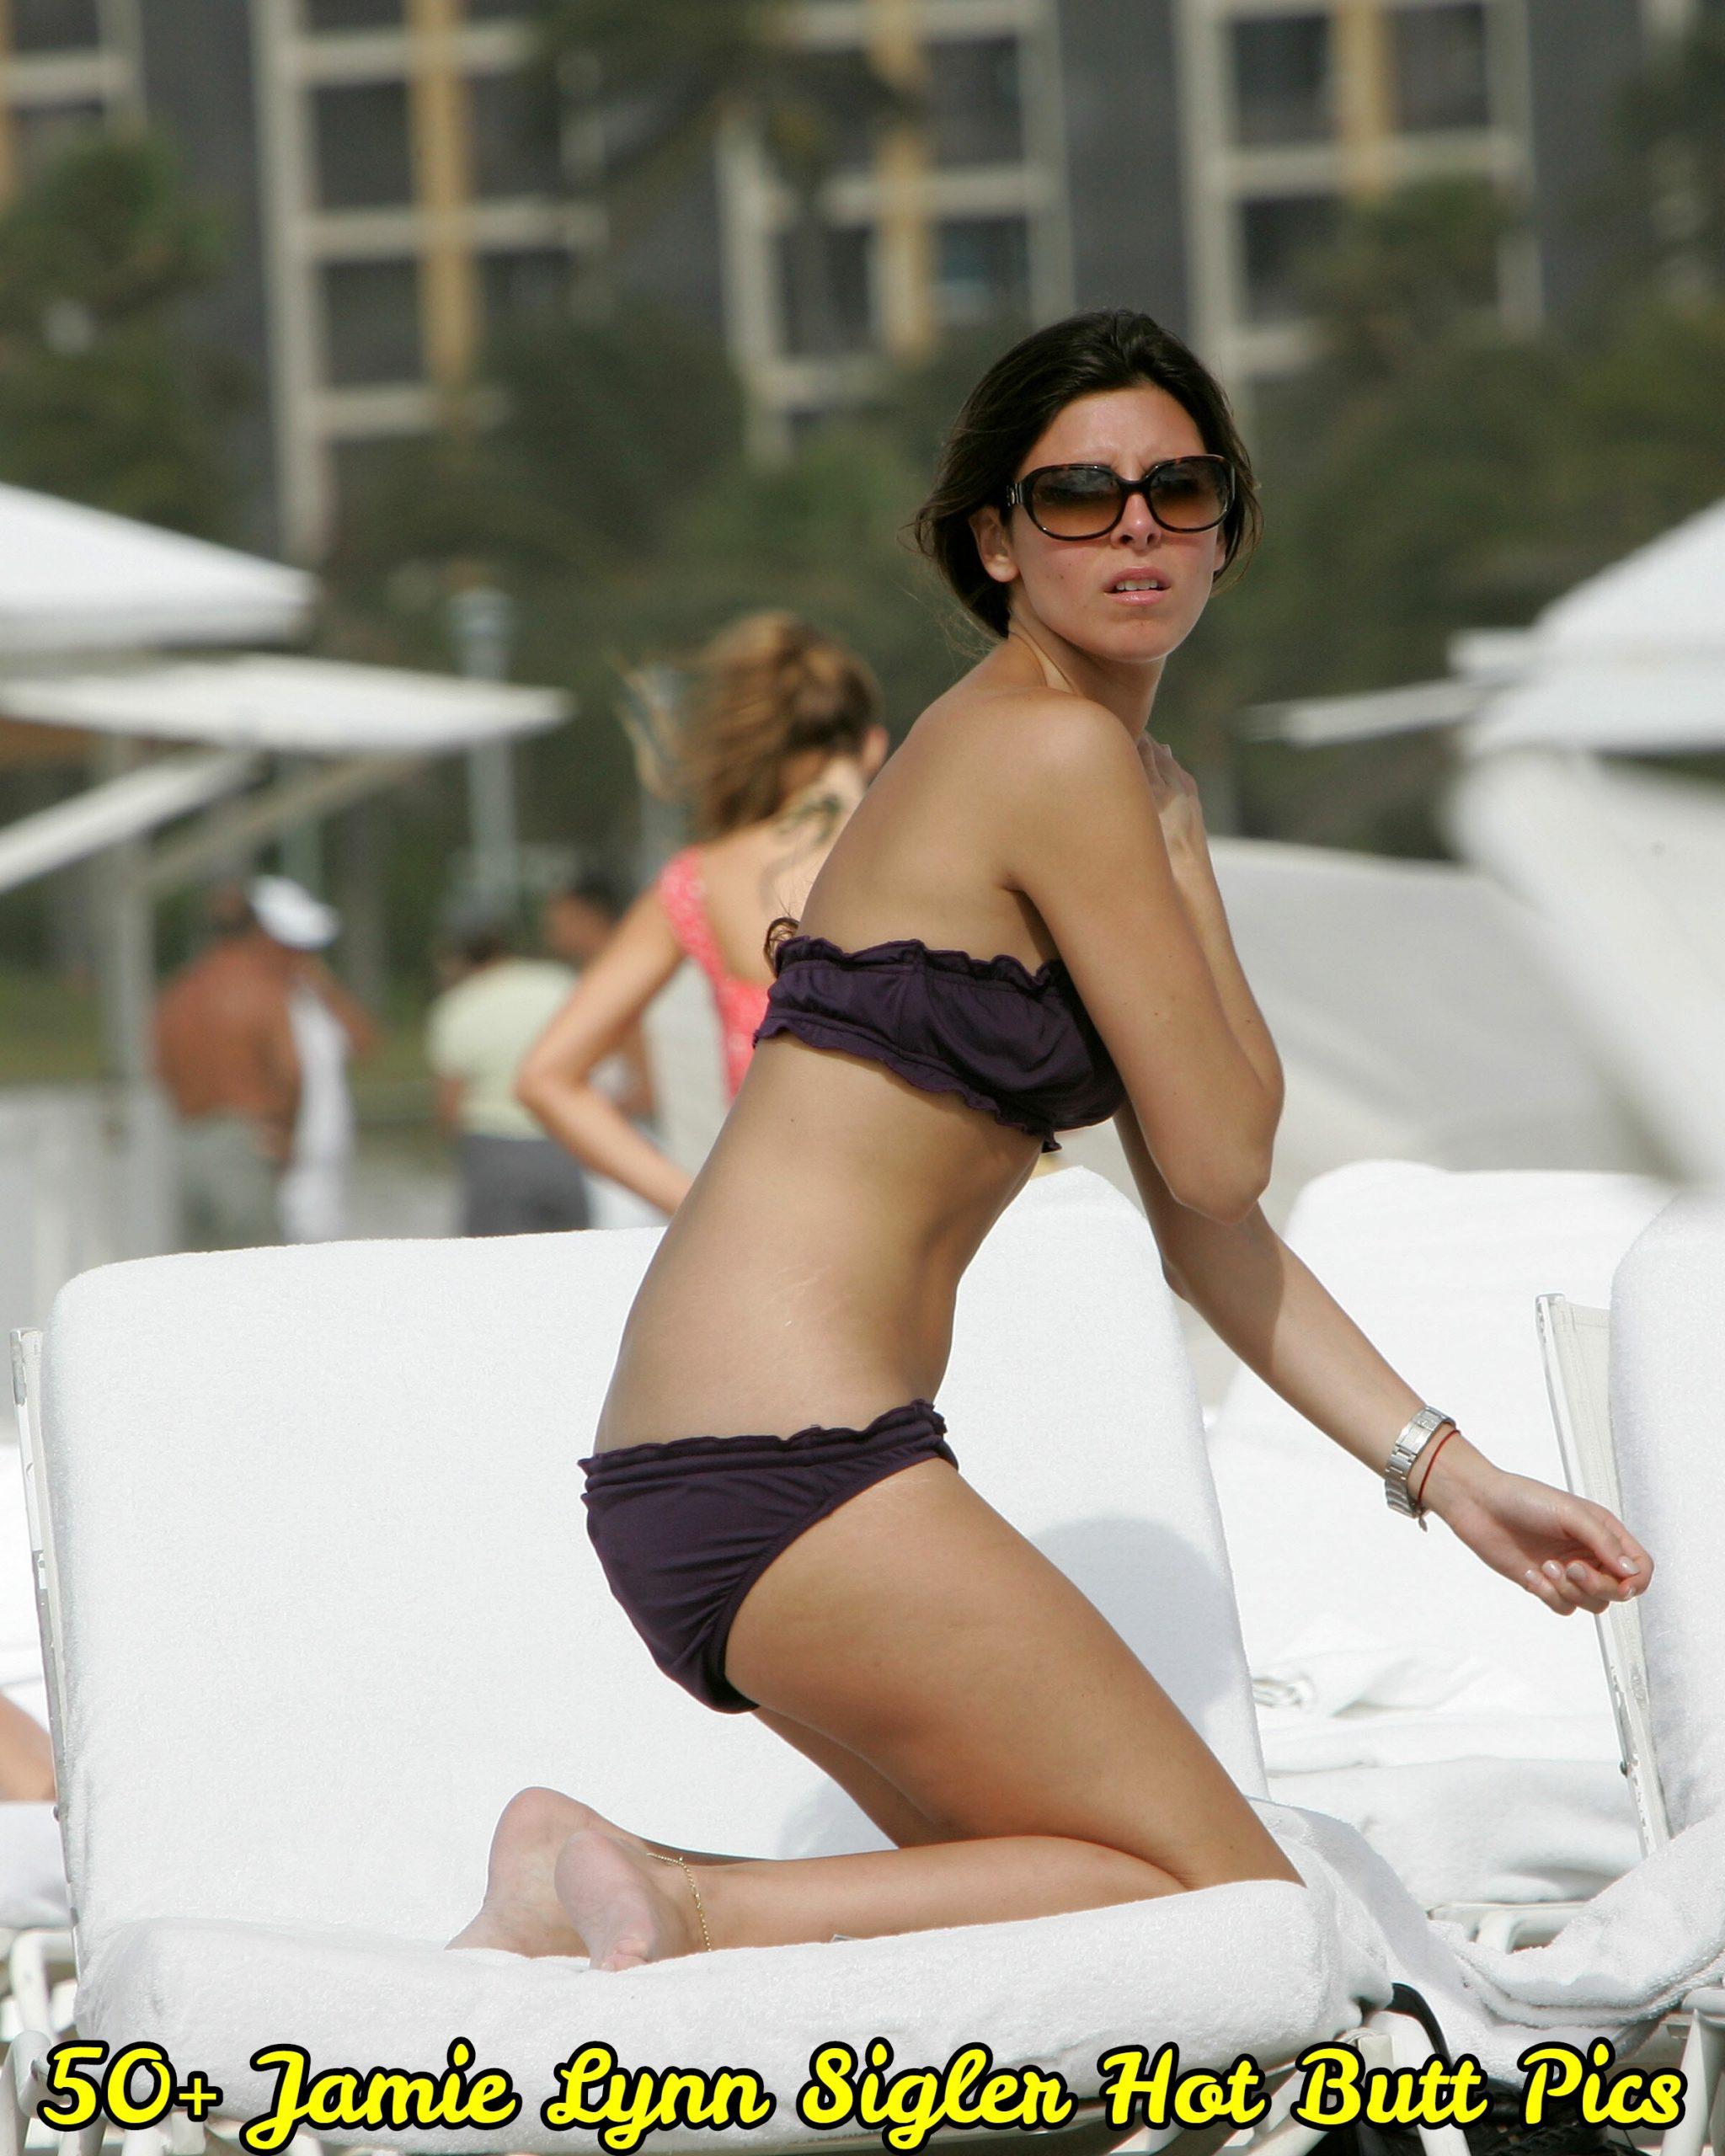 Jamie Lynn Sigler Hot Butt Pics